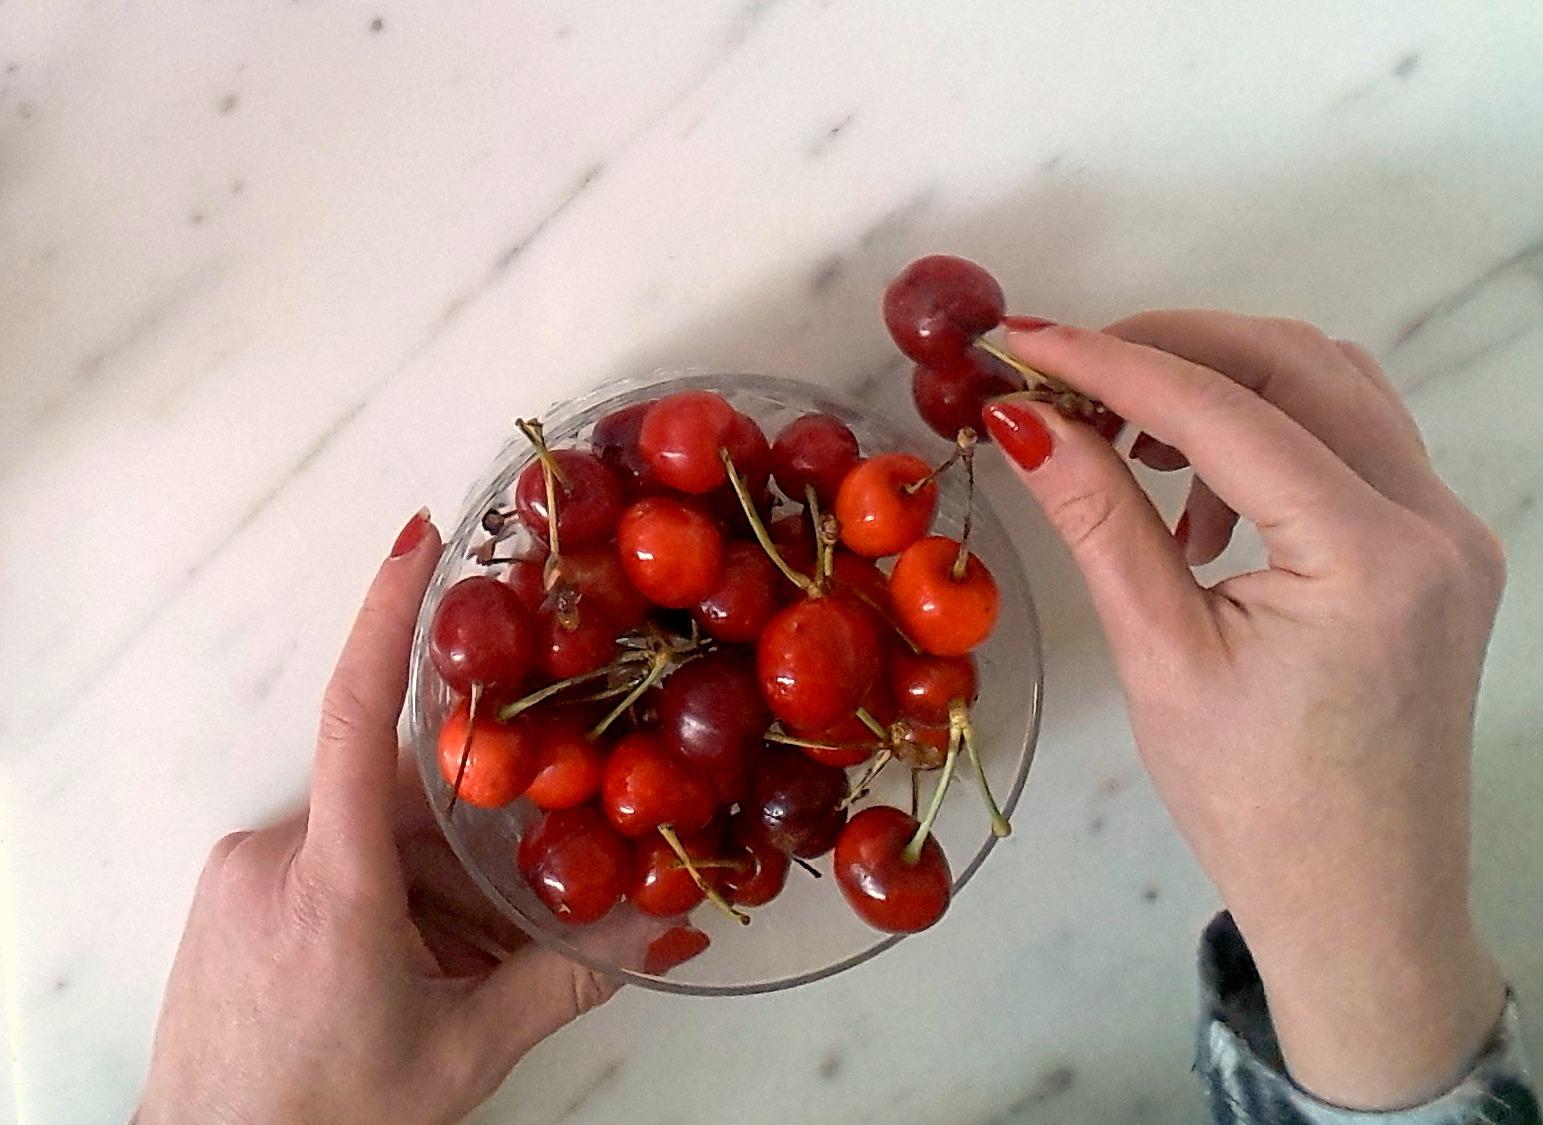 Marci+Bowman-bowl-of-cherries.jpg